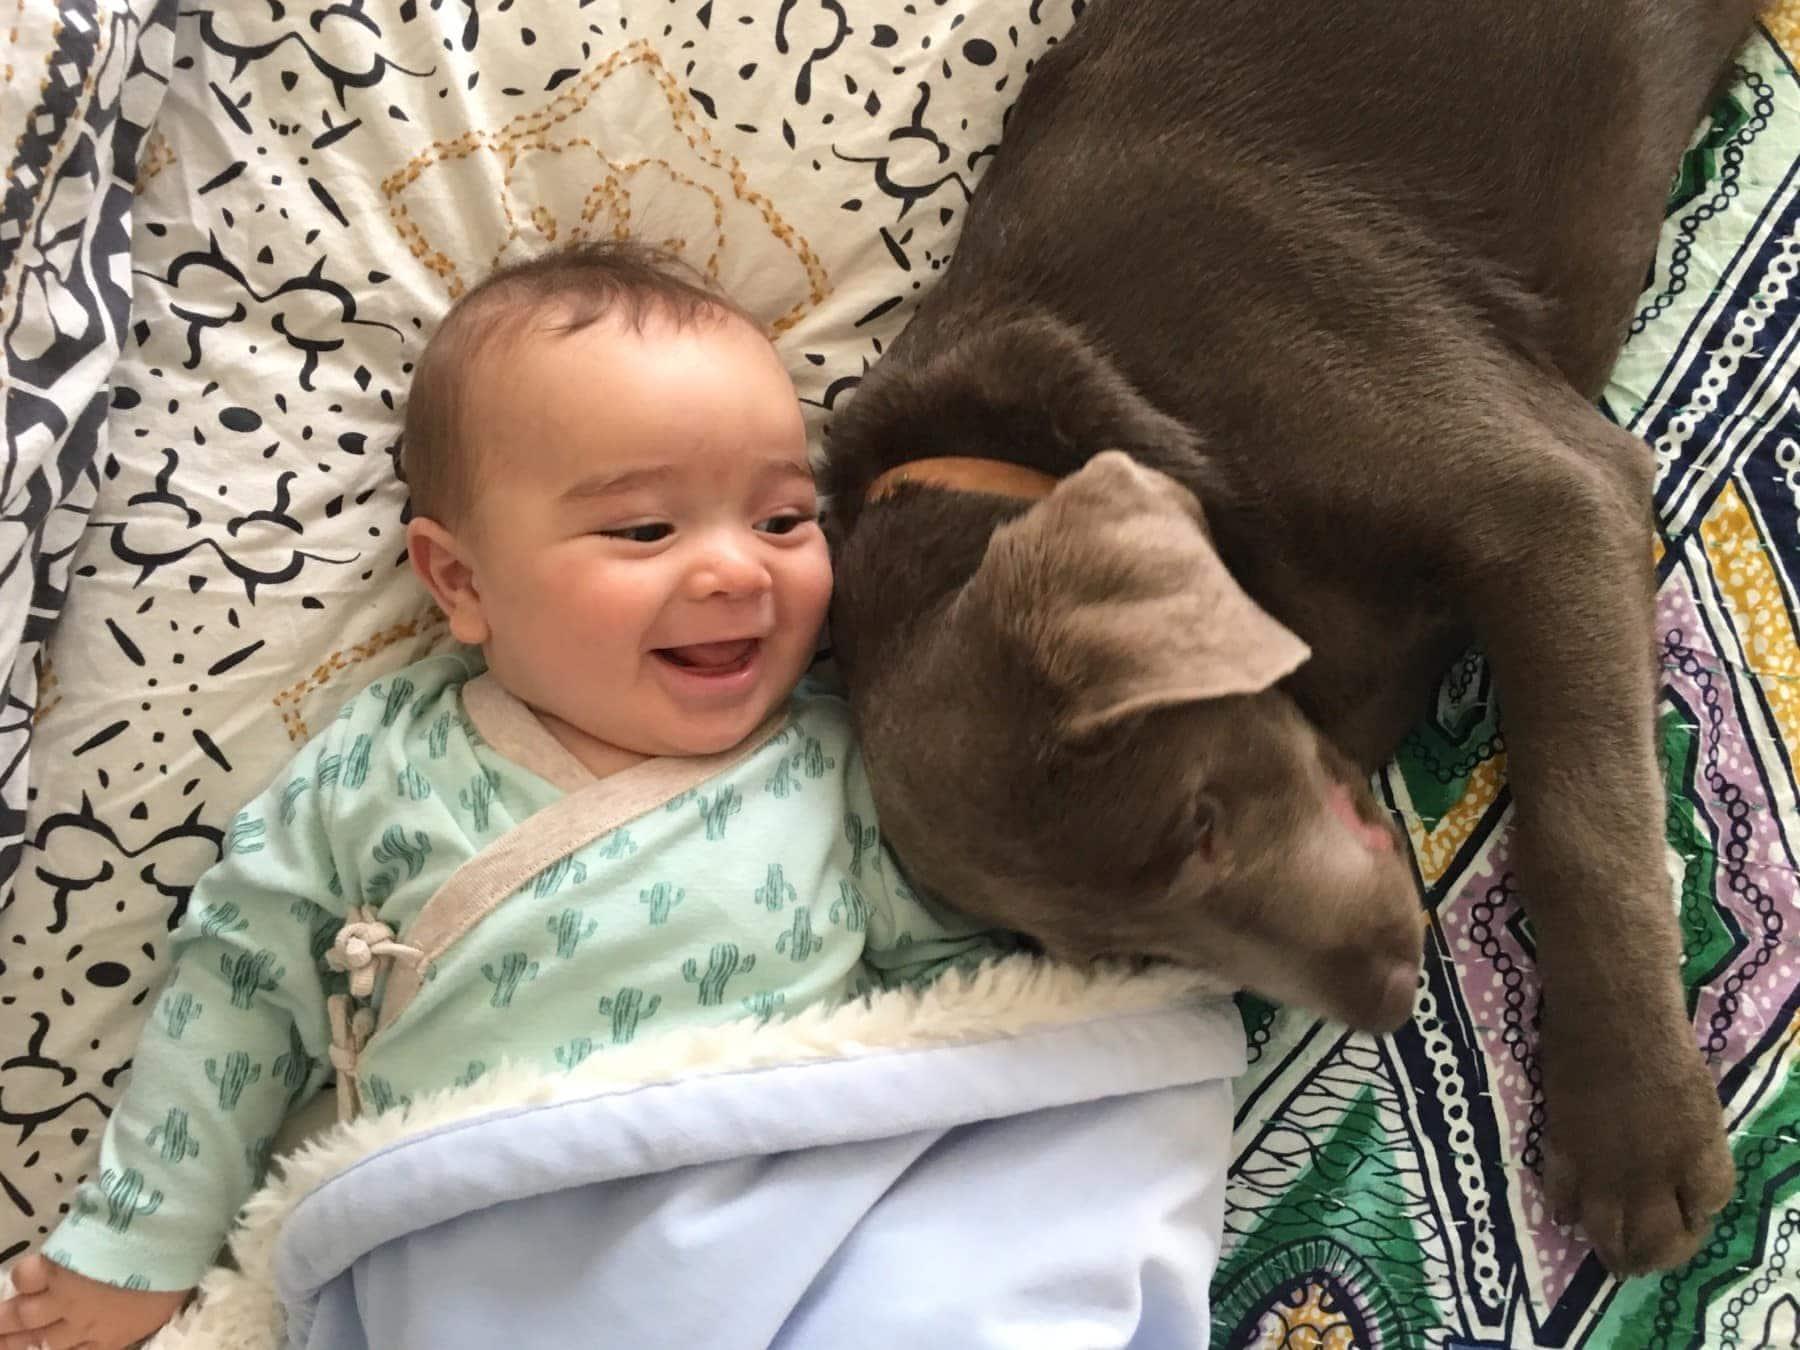 Labrador puppy and baby